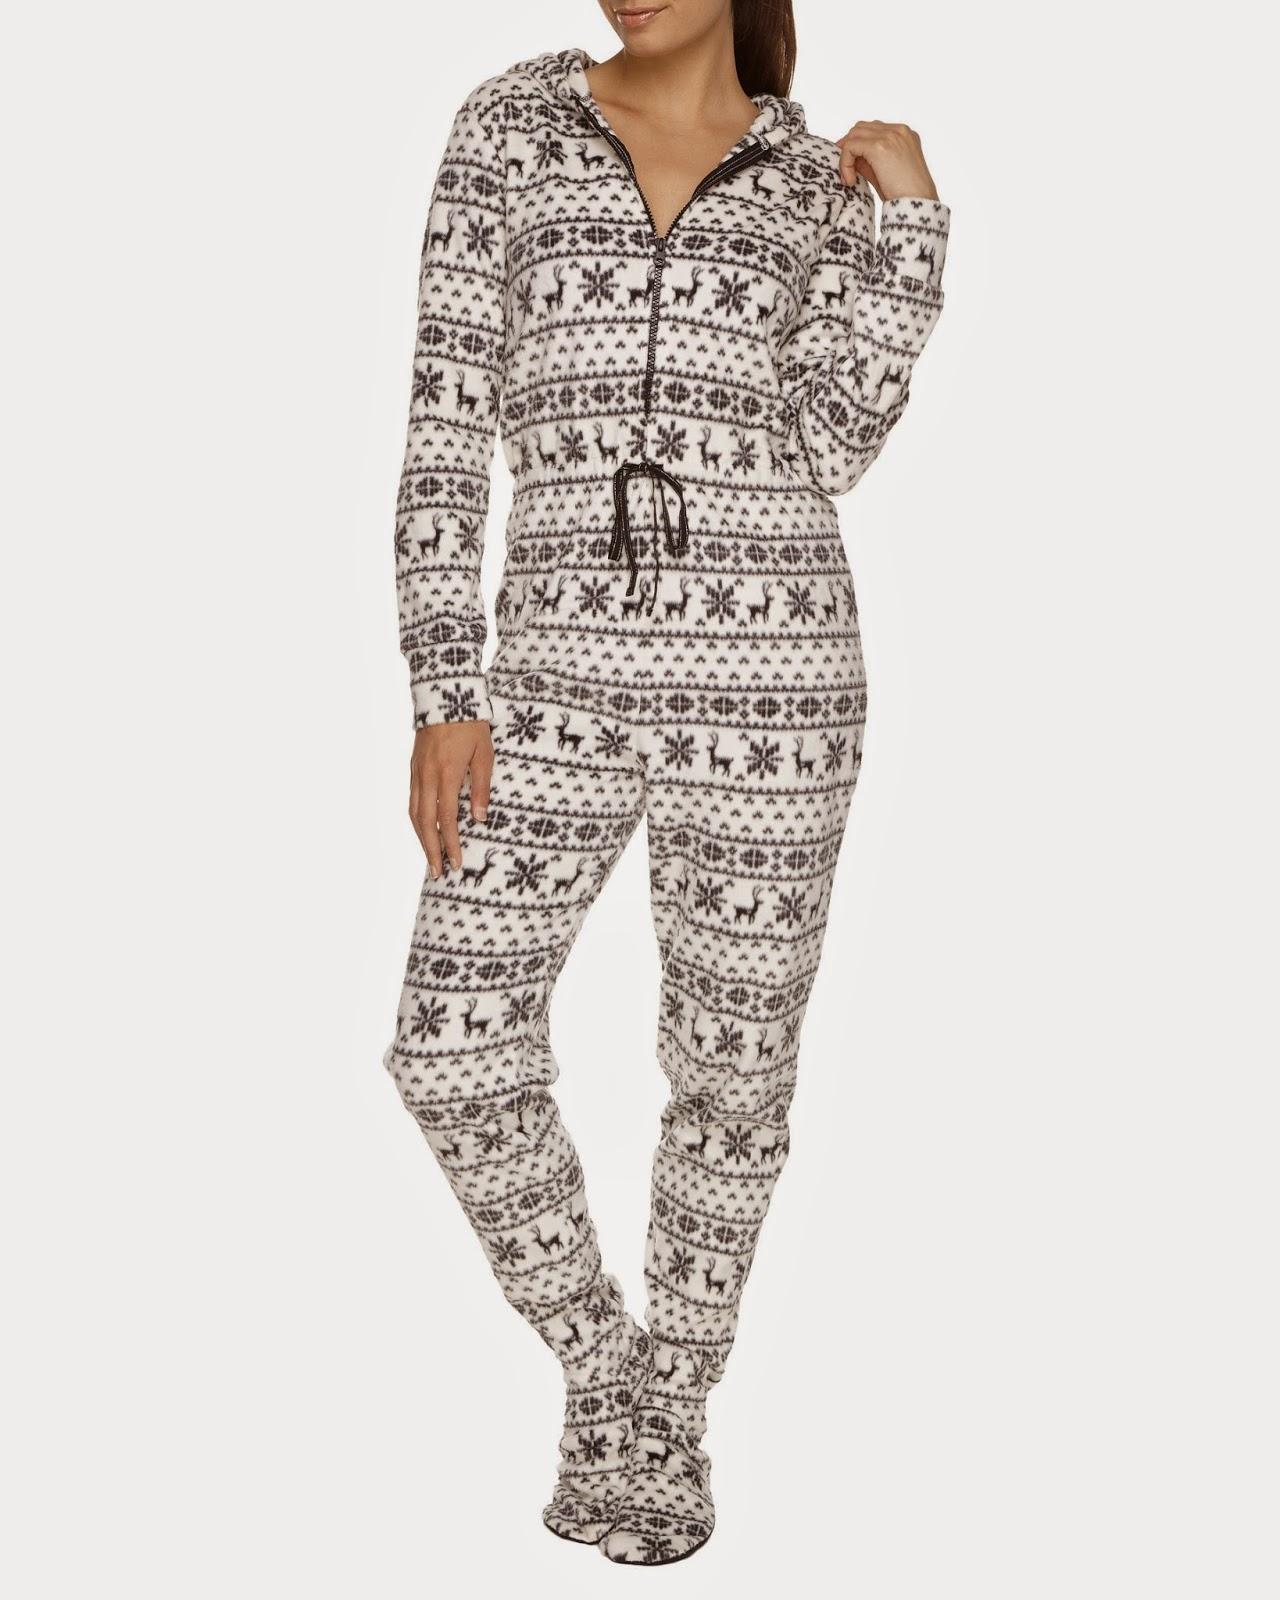 pyjamas one piece adulte en vente eBay